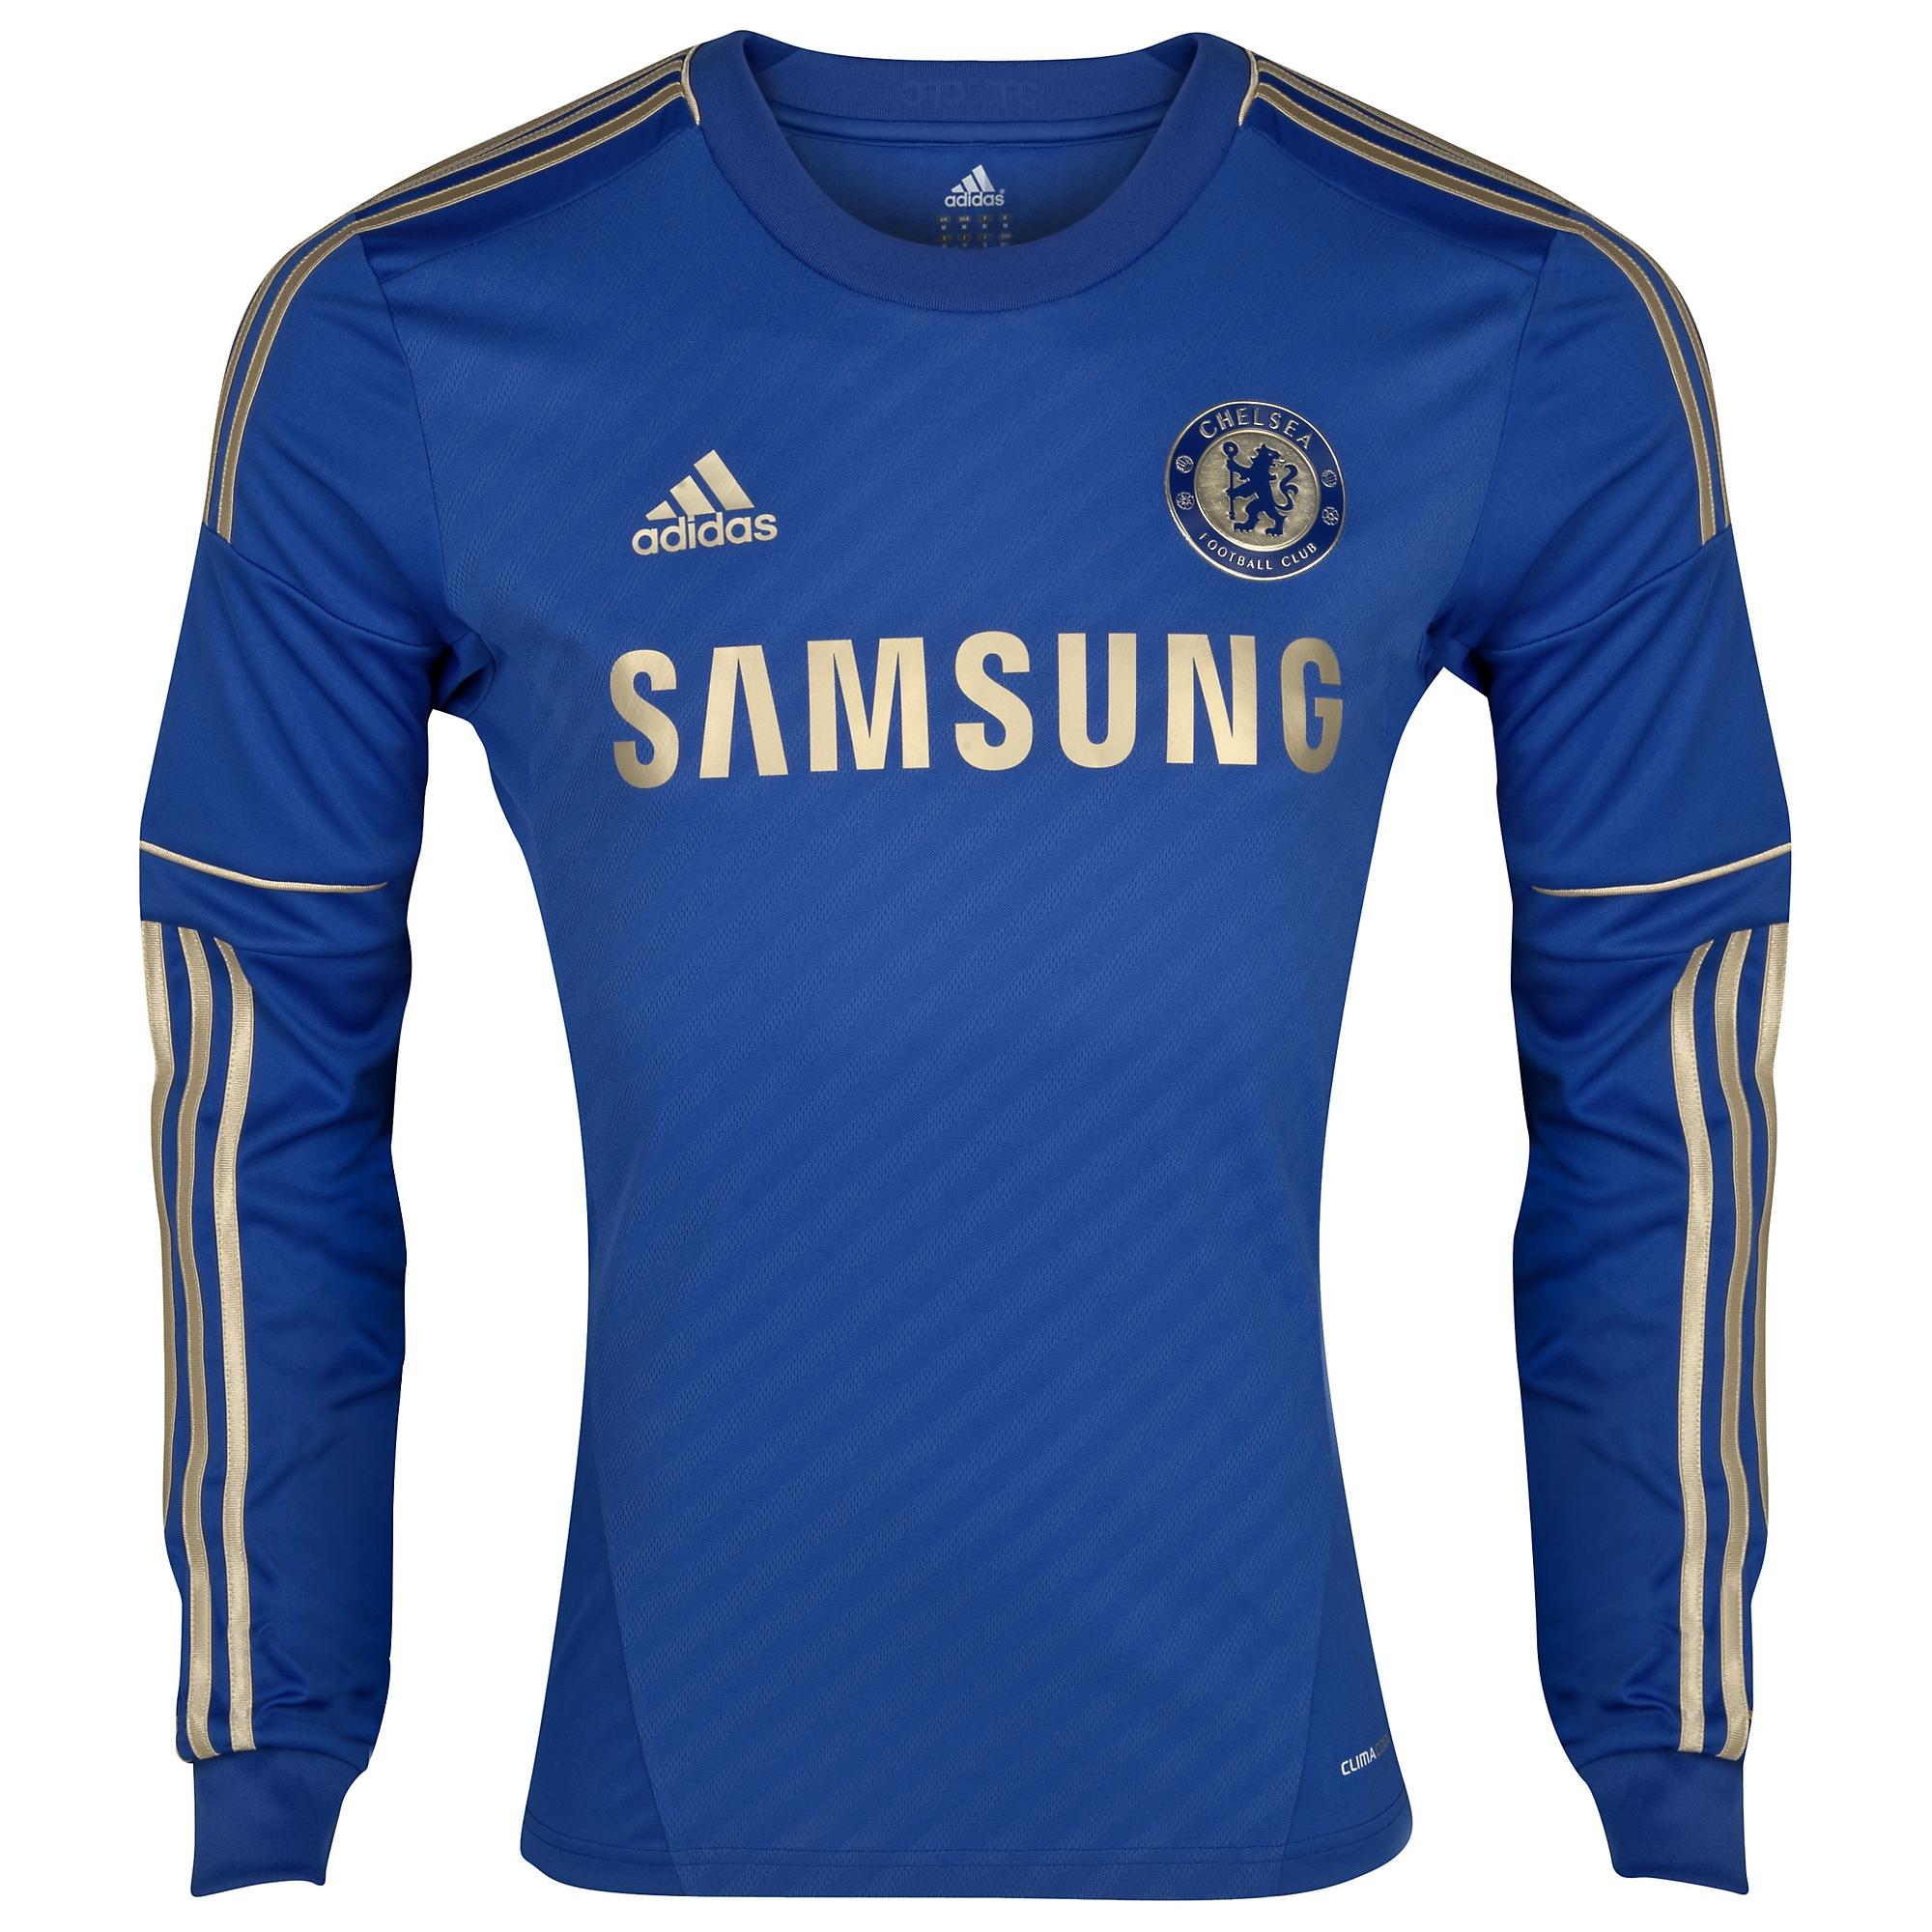 Chelsea - Hjemmebanetrøje 2012/13 L/Æ Børn